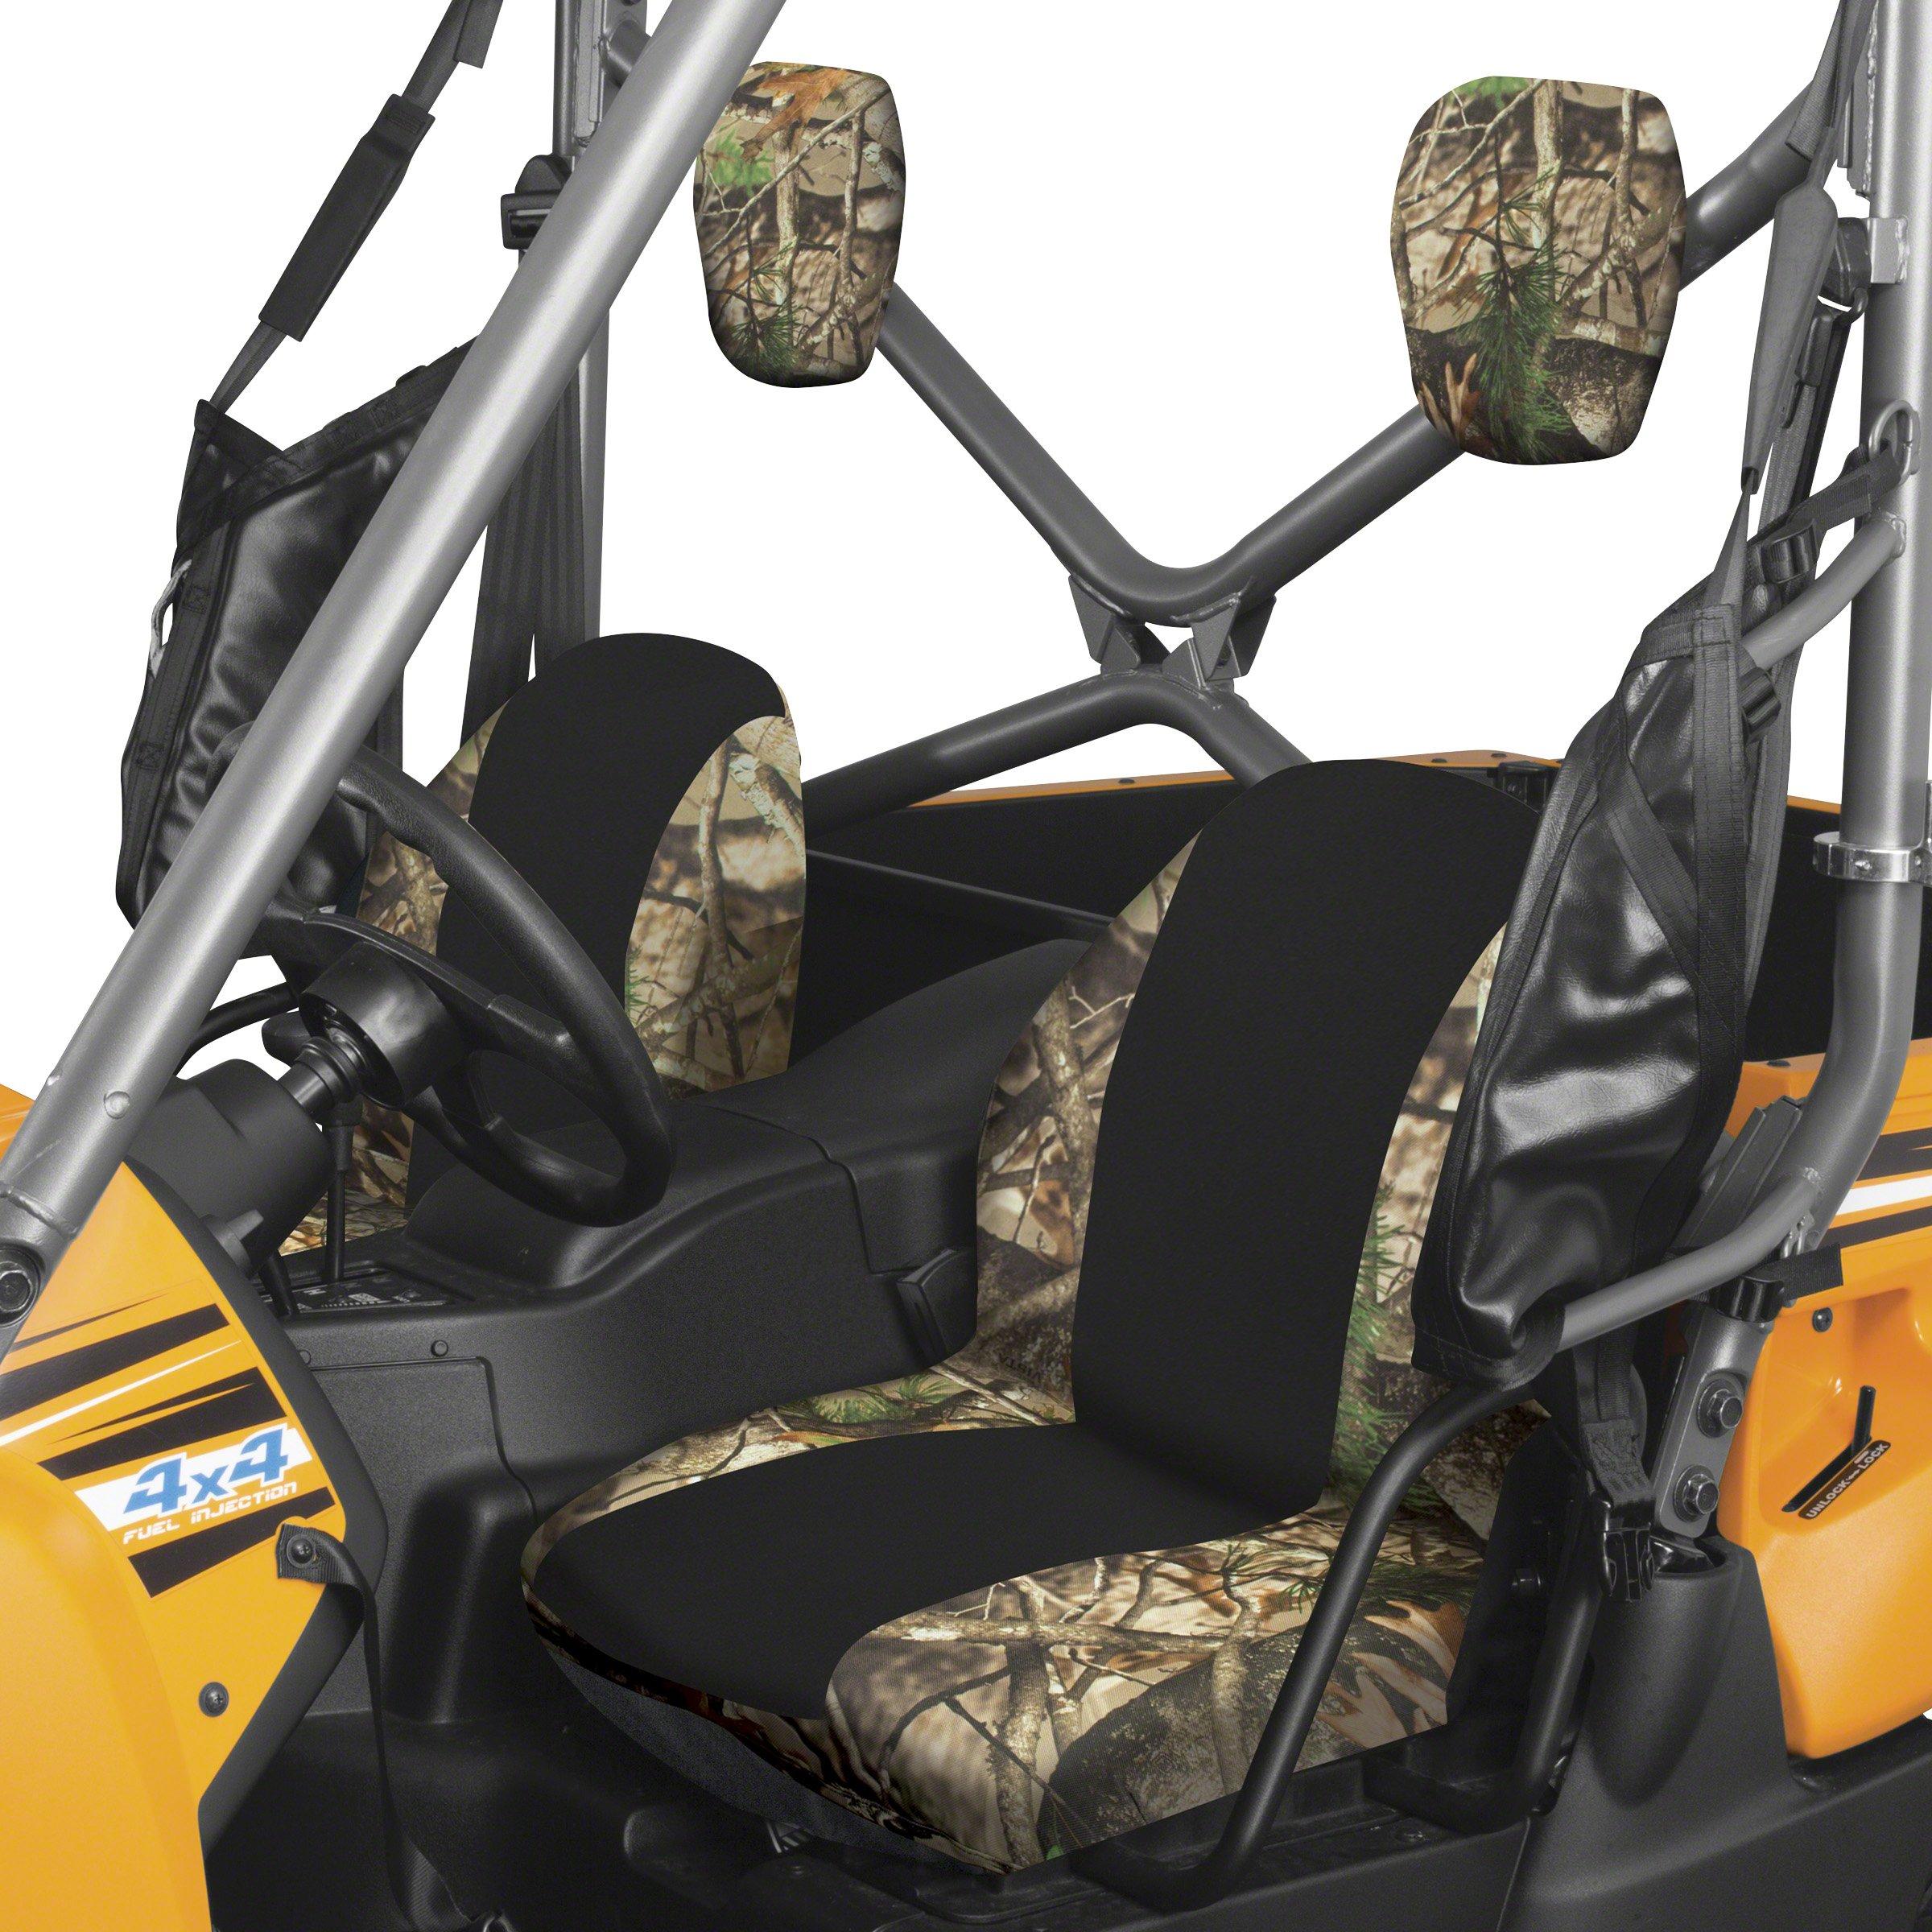 Classic Accessories Next Vista G1 Camo QuadGear UTV Bucket Seat Cover by Classic Accessories